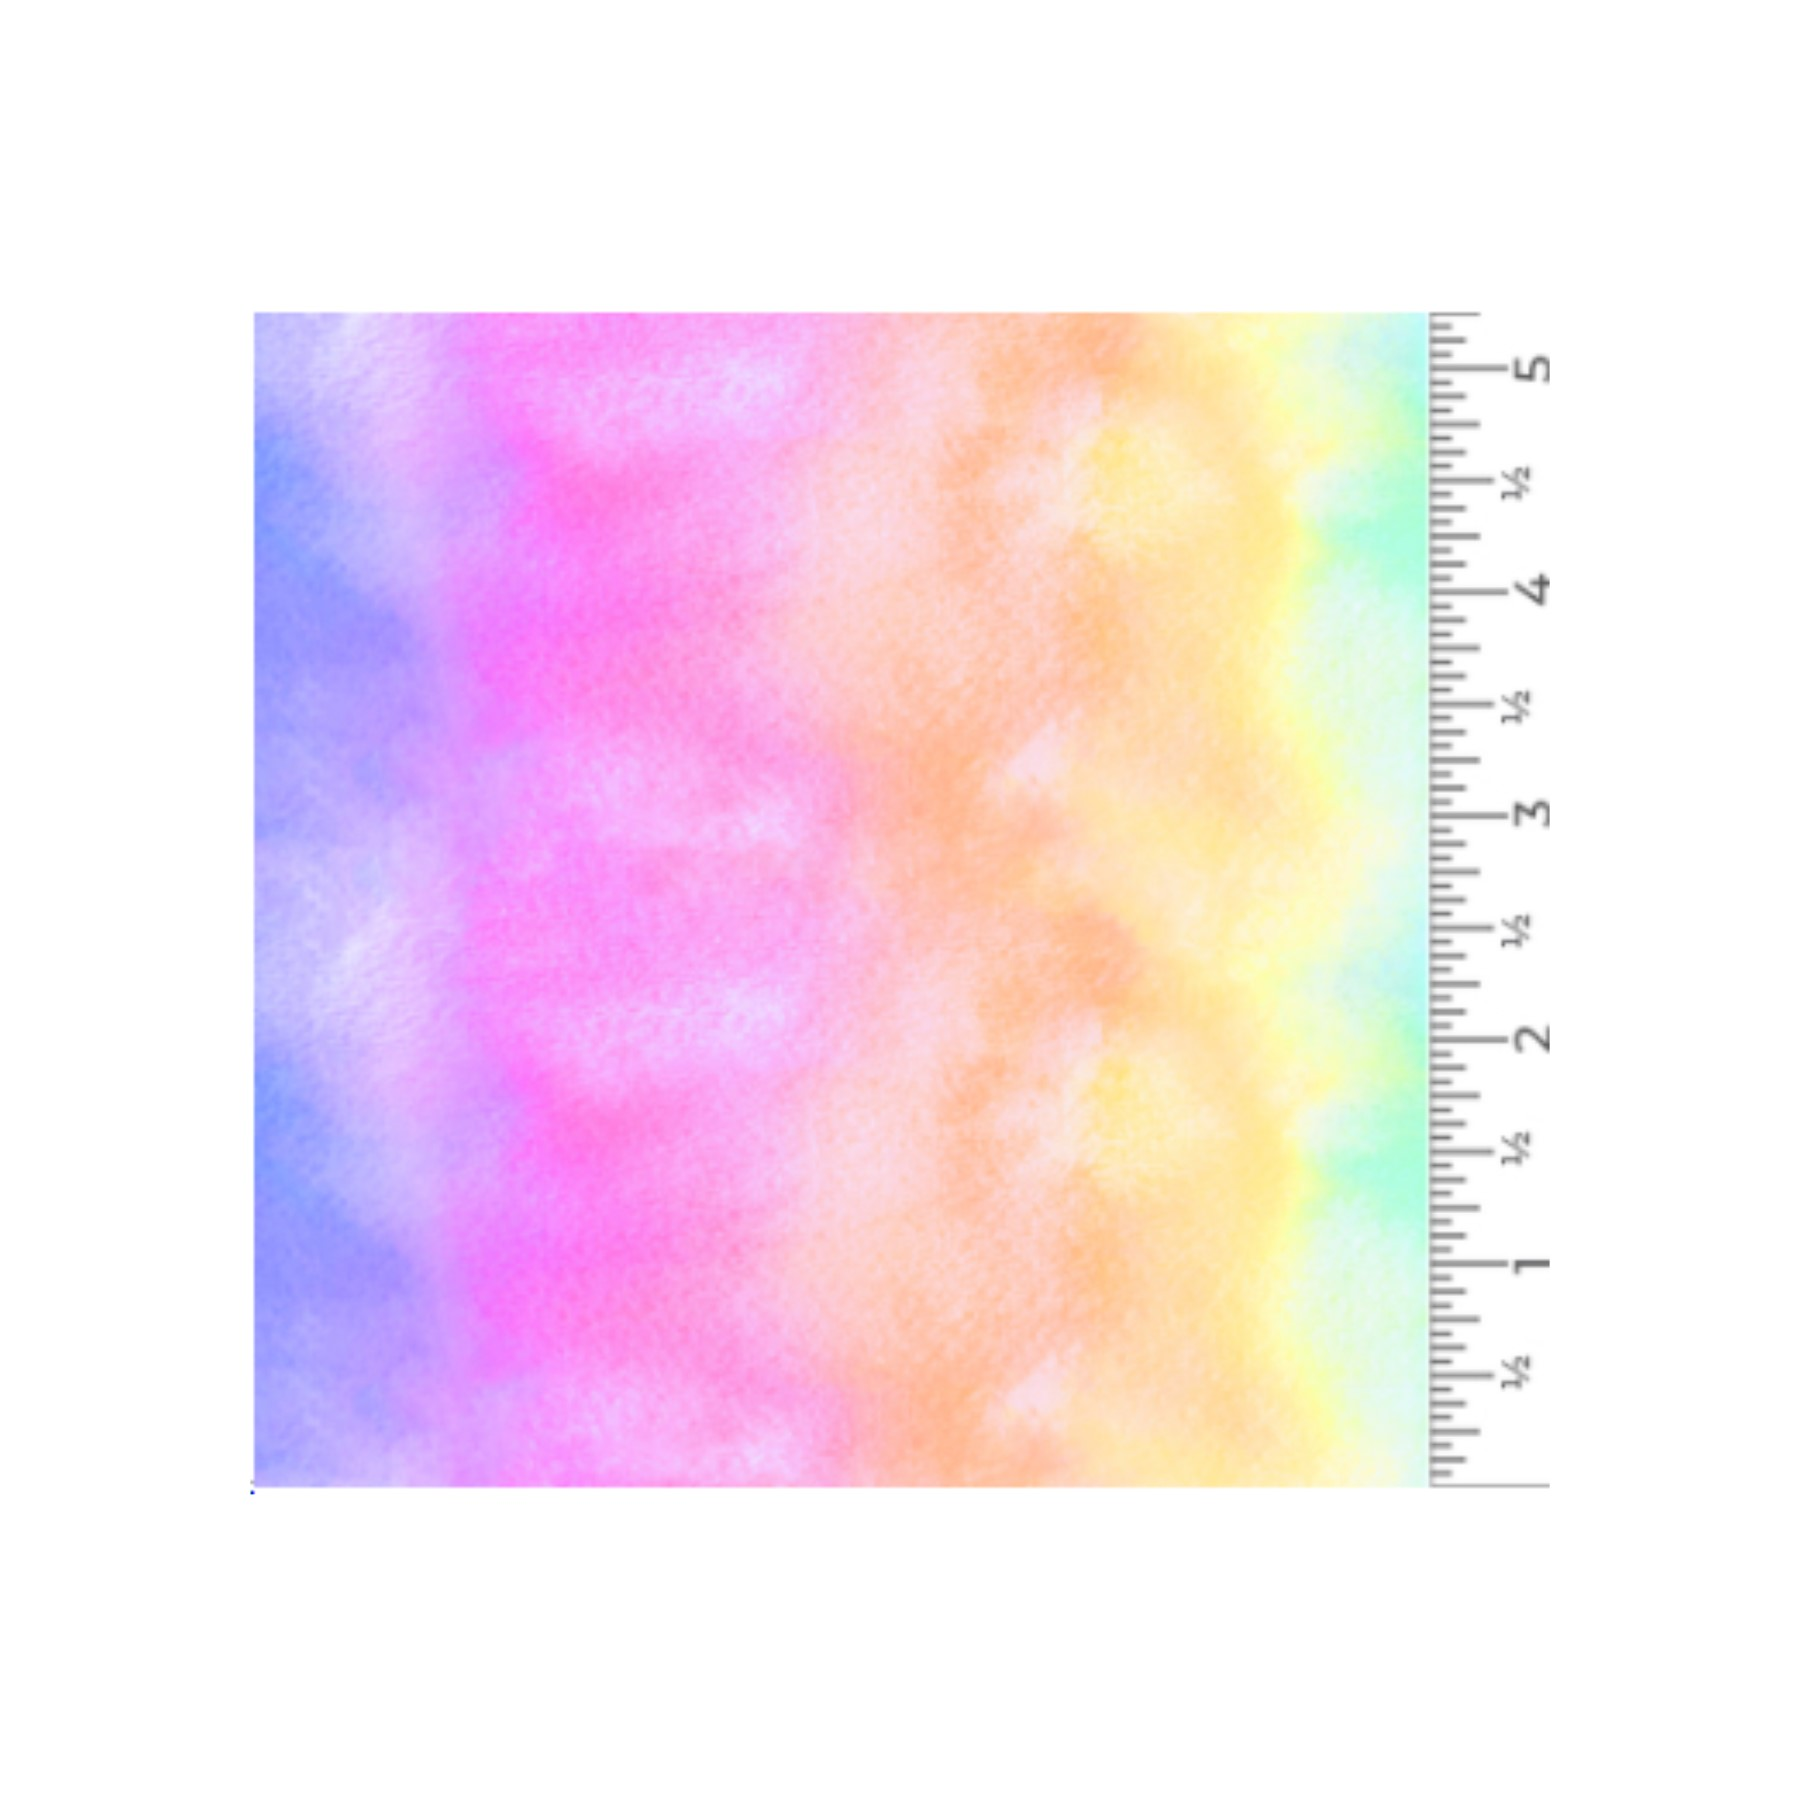 Vinilo textil diseños EasyPatterns® 30 x 50 cm Arcoiris acuarela